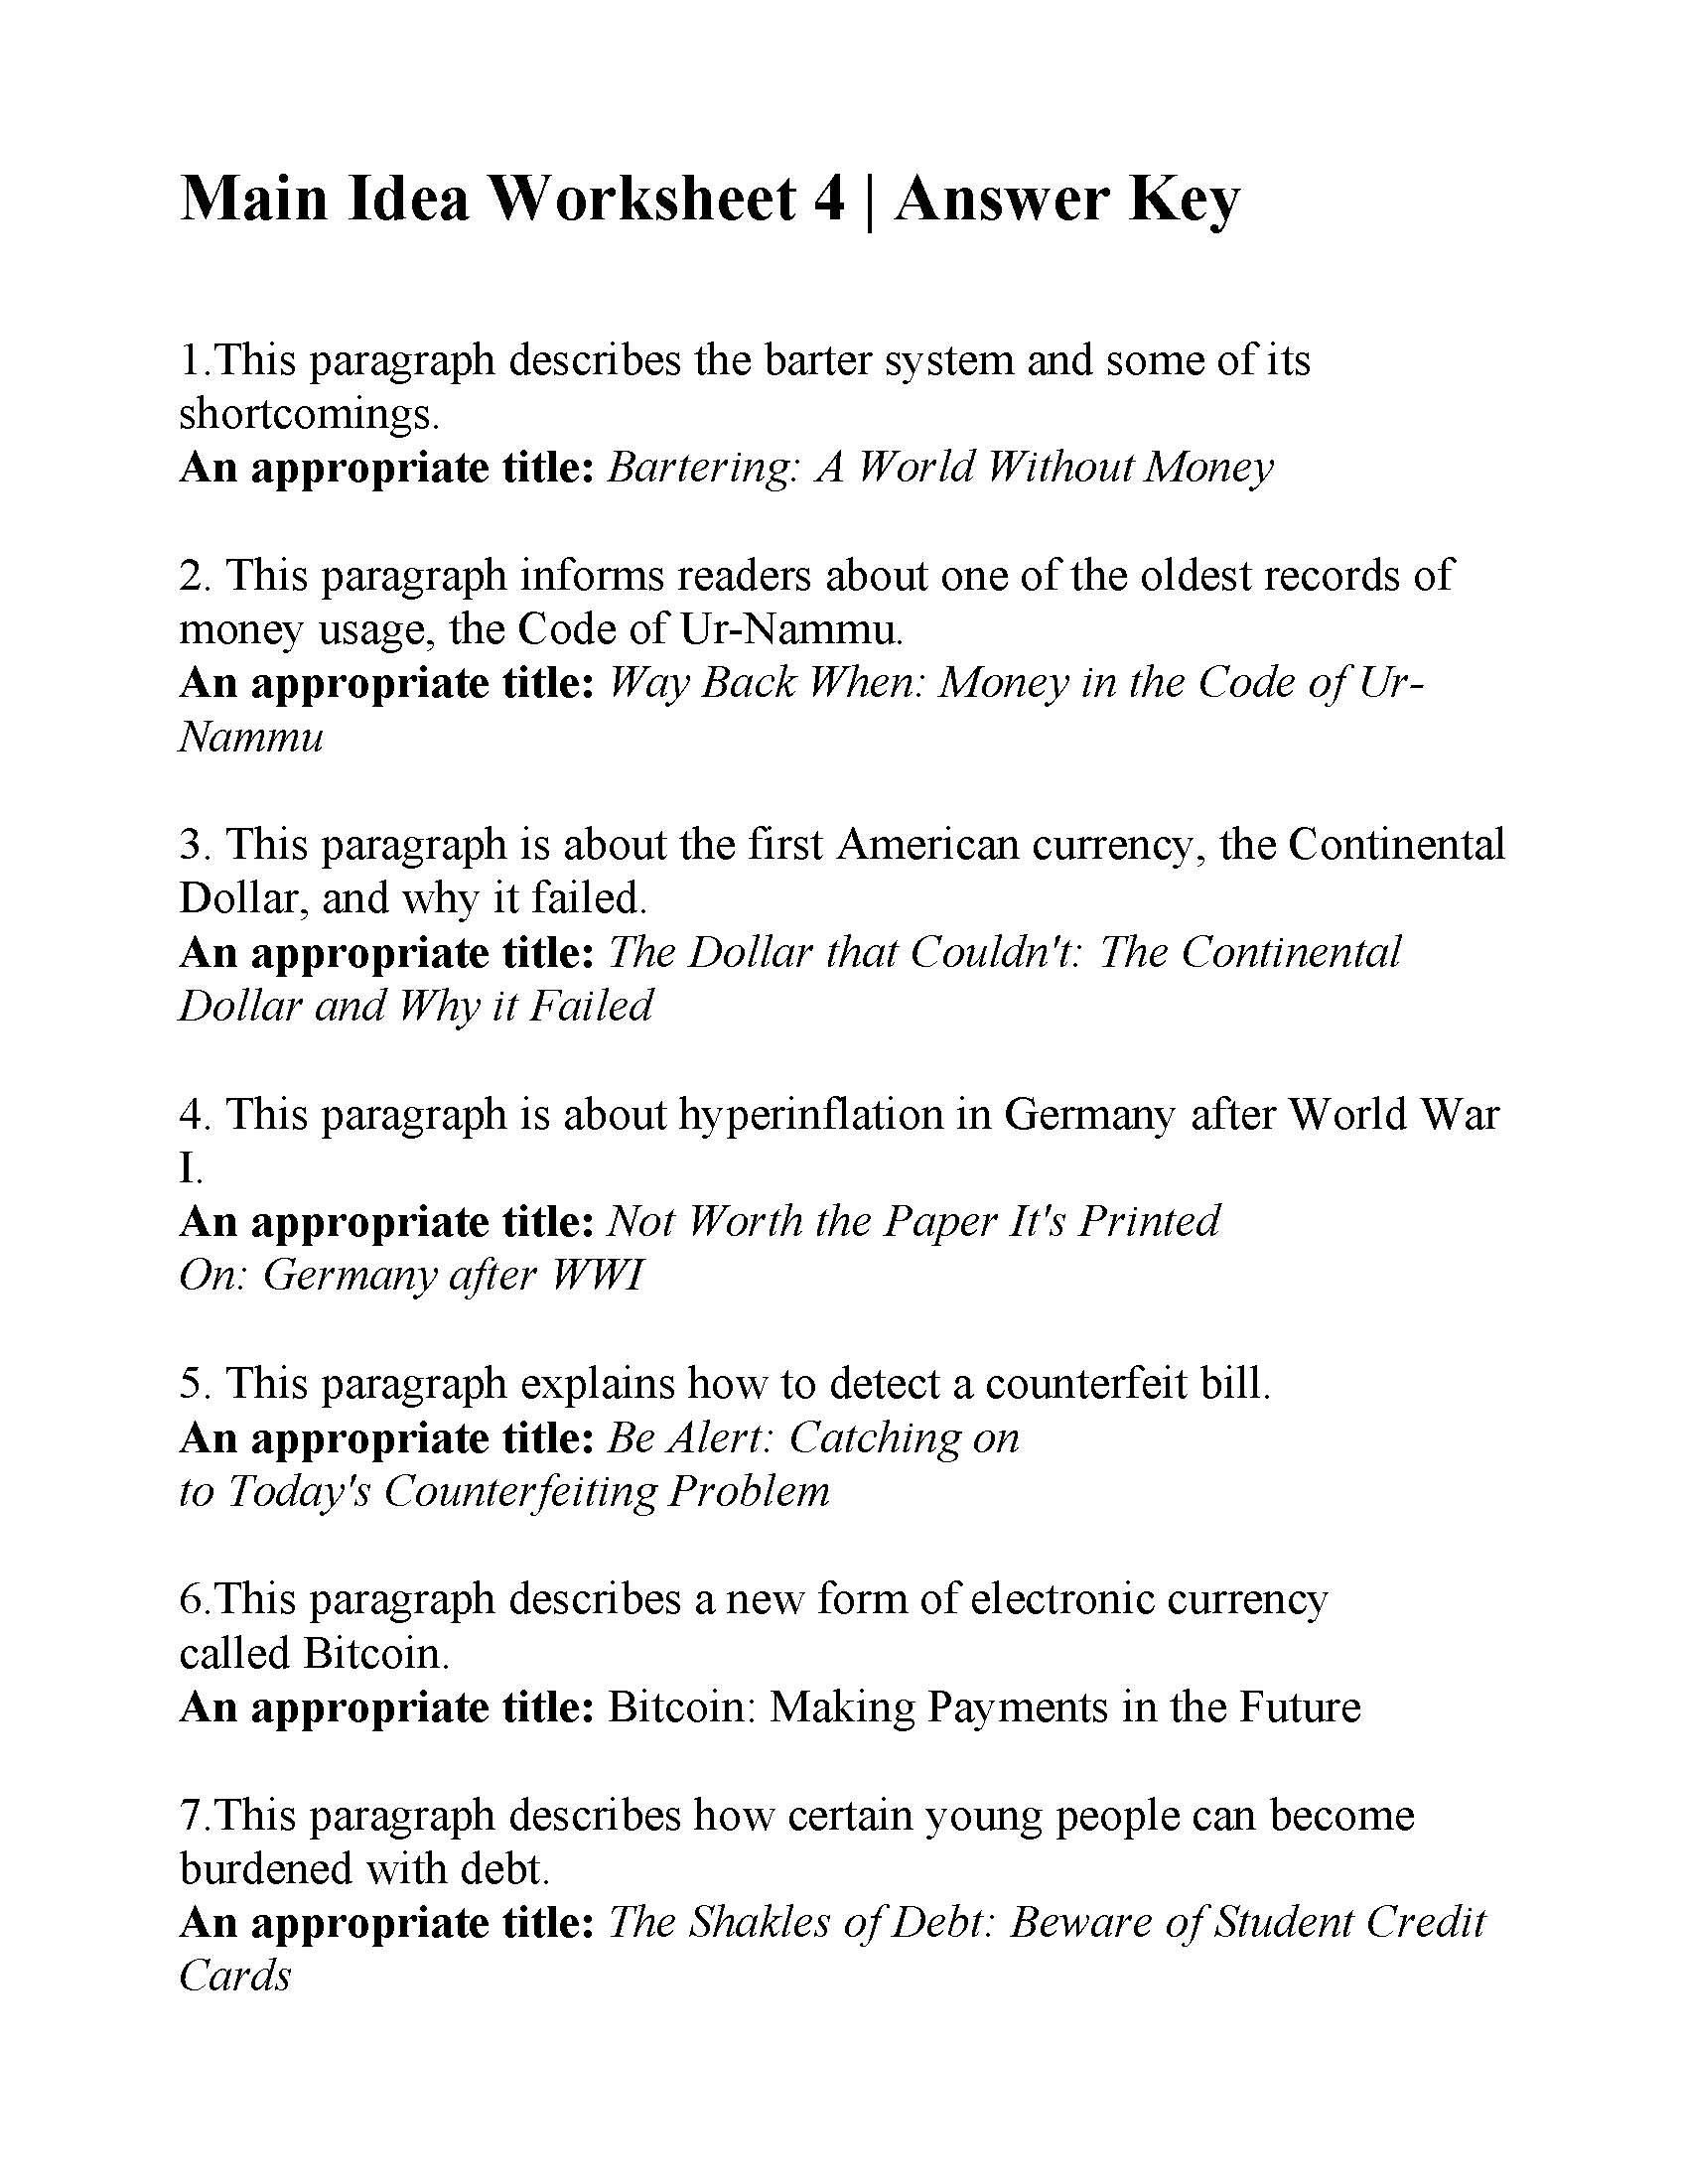 Main Idea Worksheet 4  Answers In Main Idea Worksheets